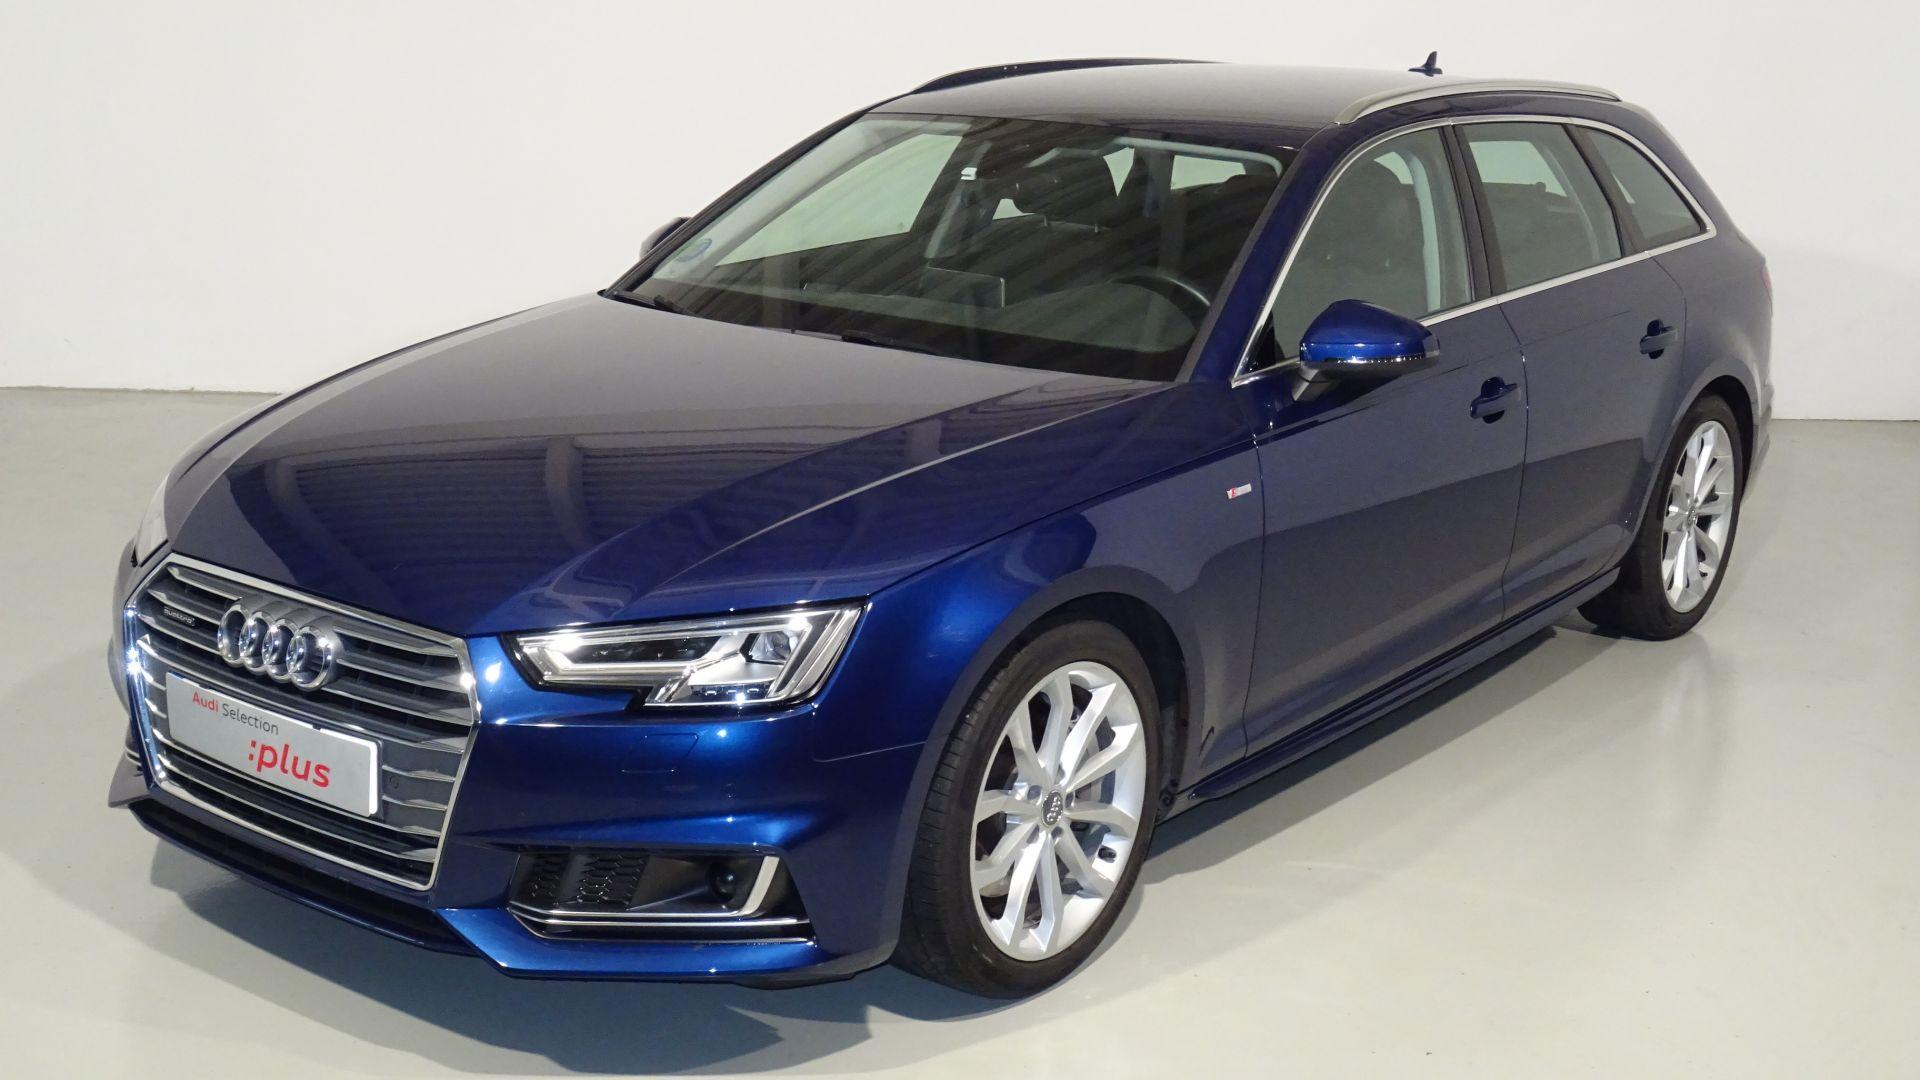 Audi A4 S line ed 2.0 TFSI qua-ultra S tro Avant